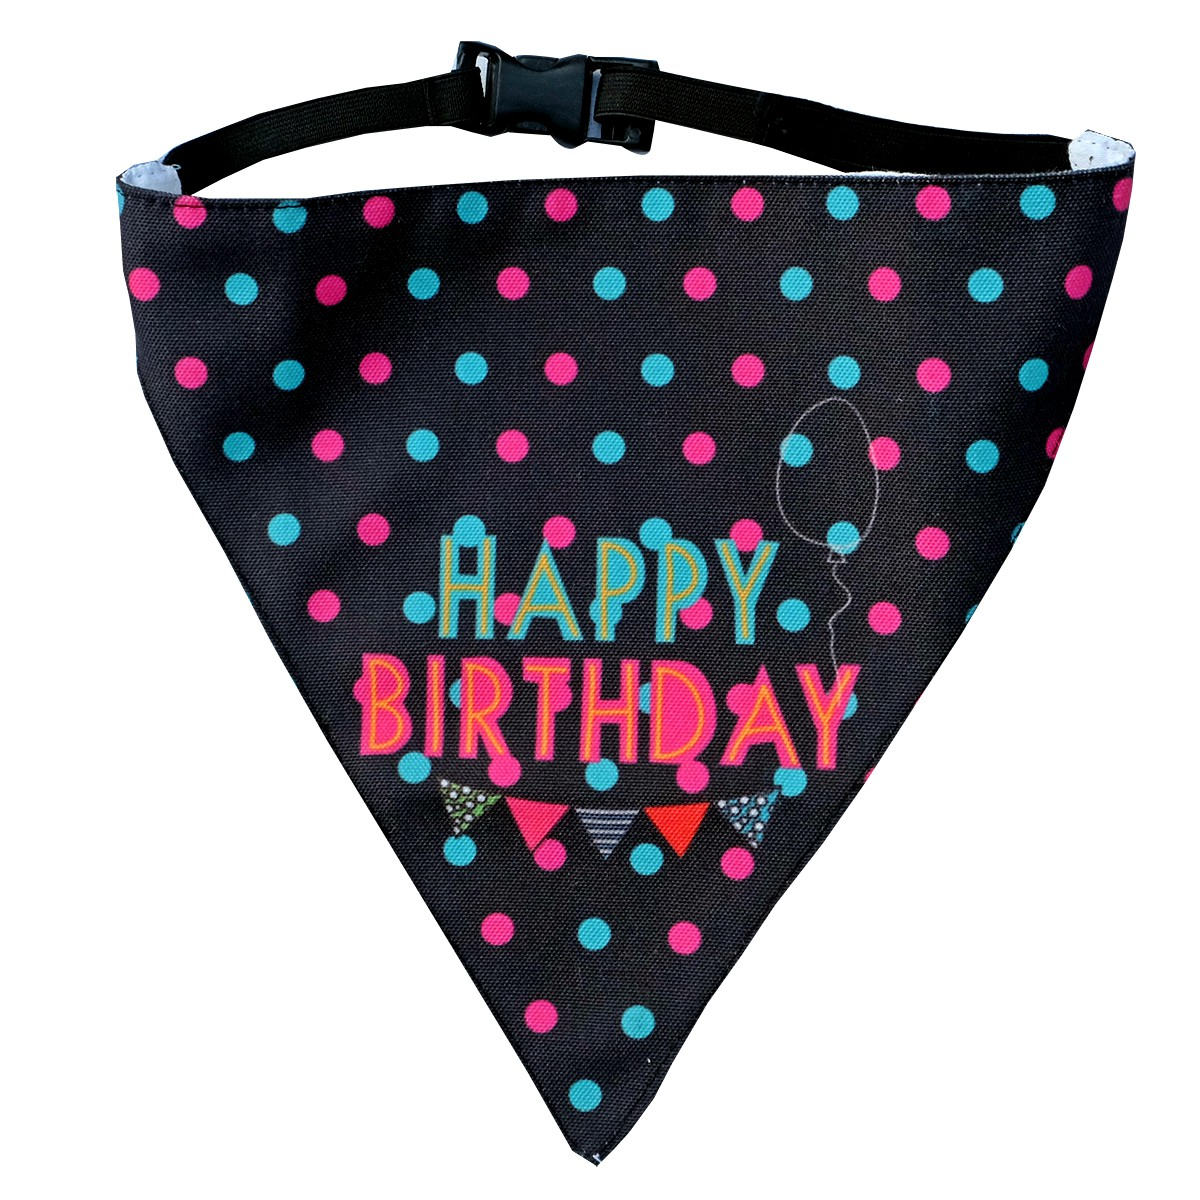 LANA Paws Happy Birthday Adjustable Bandana -Small & Medium